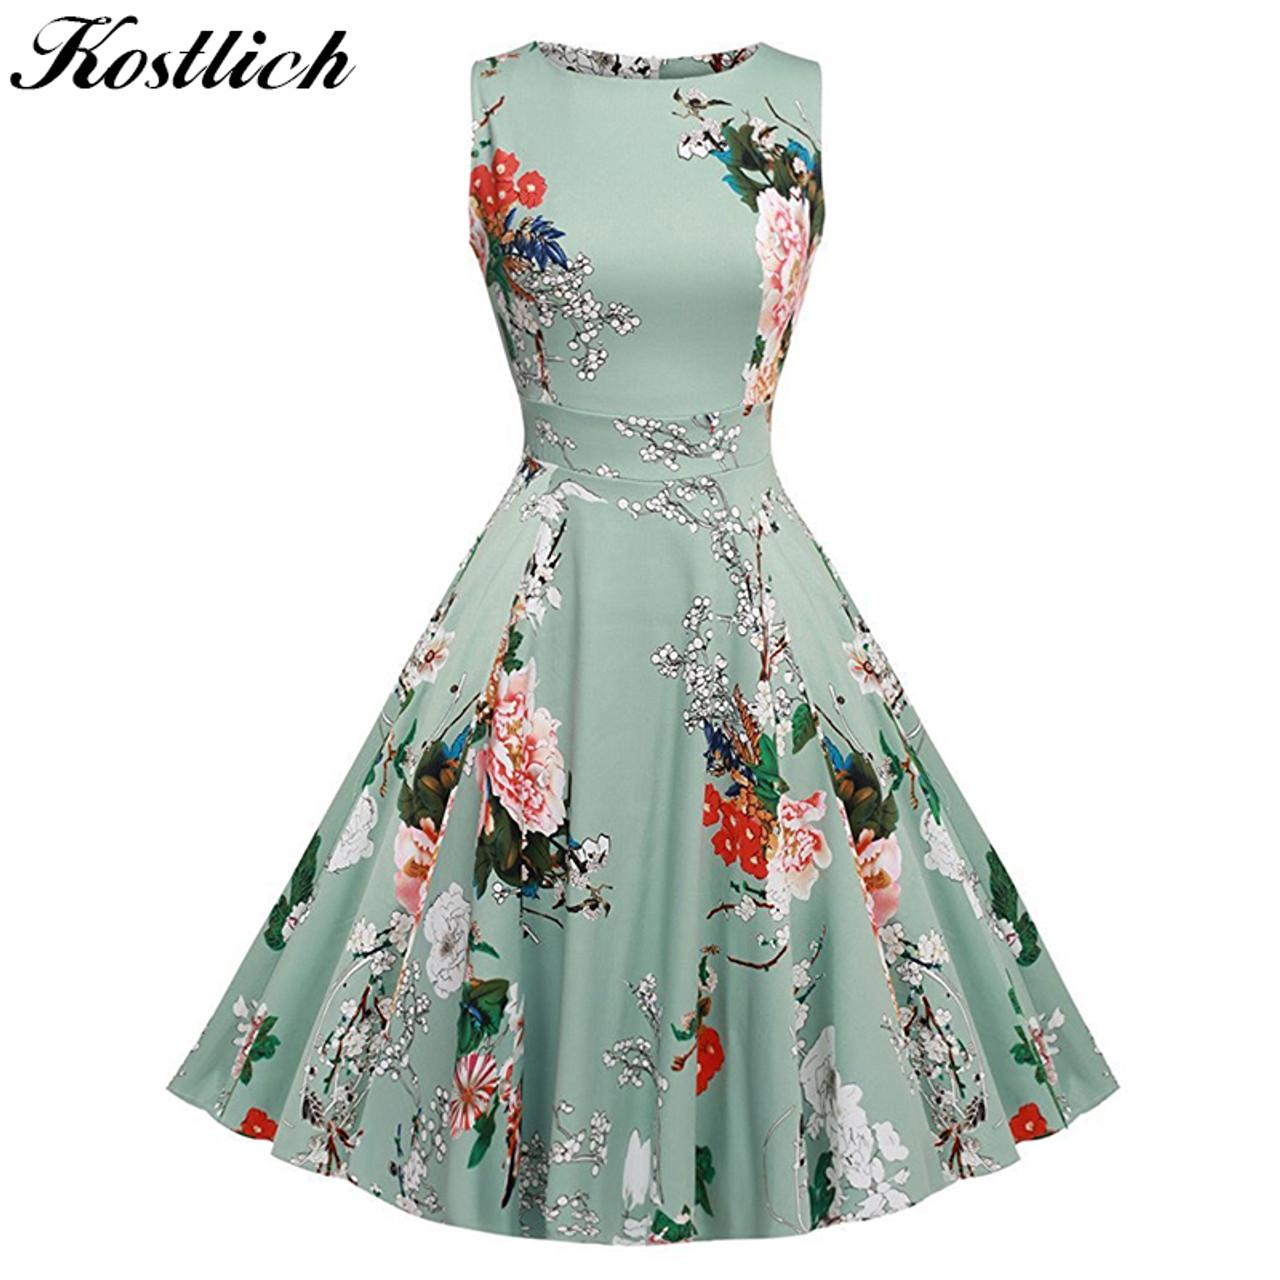 2184291db2827 Kostlich Floral Print Summer Dress Women 2018 Sleeveless Tunic 50s Vintage  Dress Belt Elegant Rockabilly Party Dresses Sundress